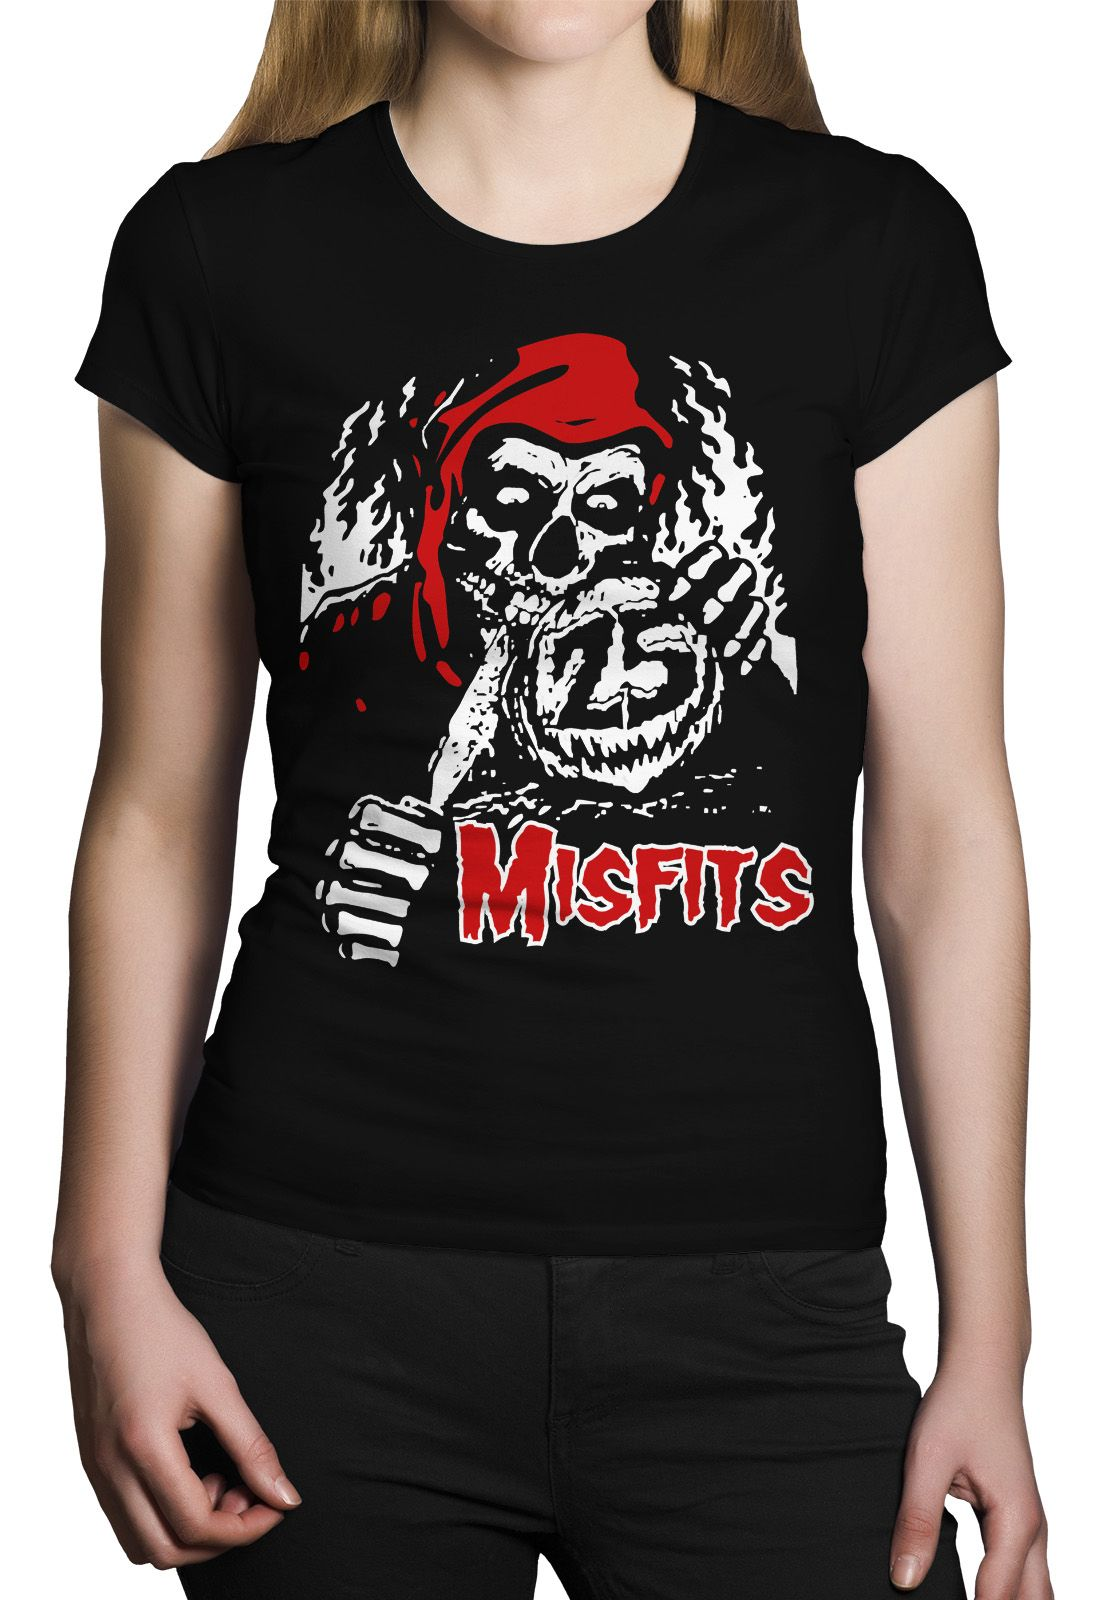 Camiseta Misfits 25 Years - 006  - HShop